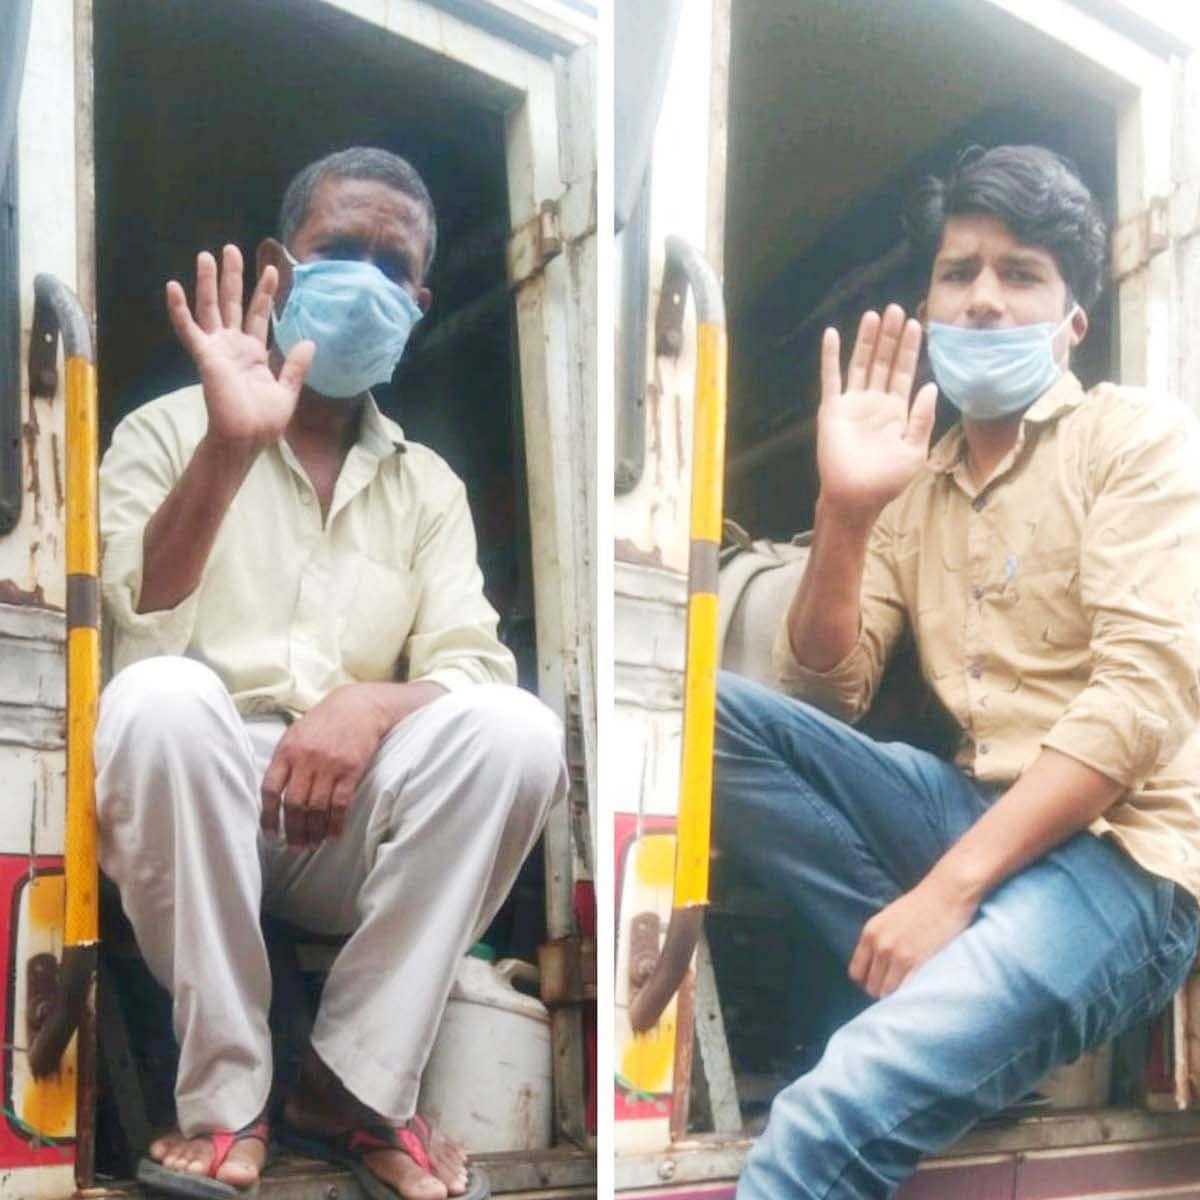 Madhya Pradesh: In Nagda, Mohanshri Foundation helps over 400 stranded persons reach home